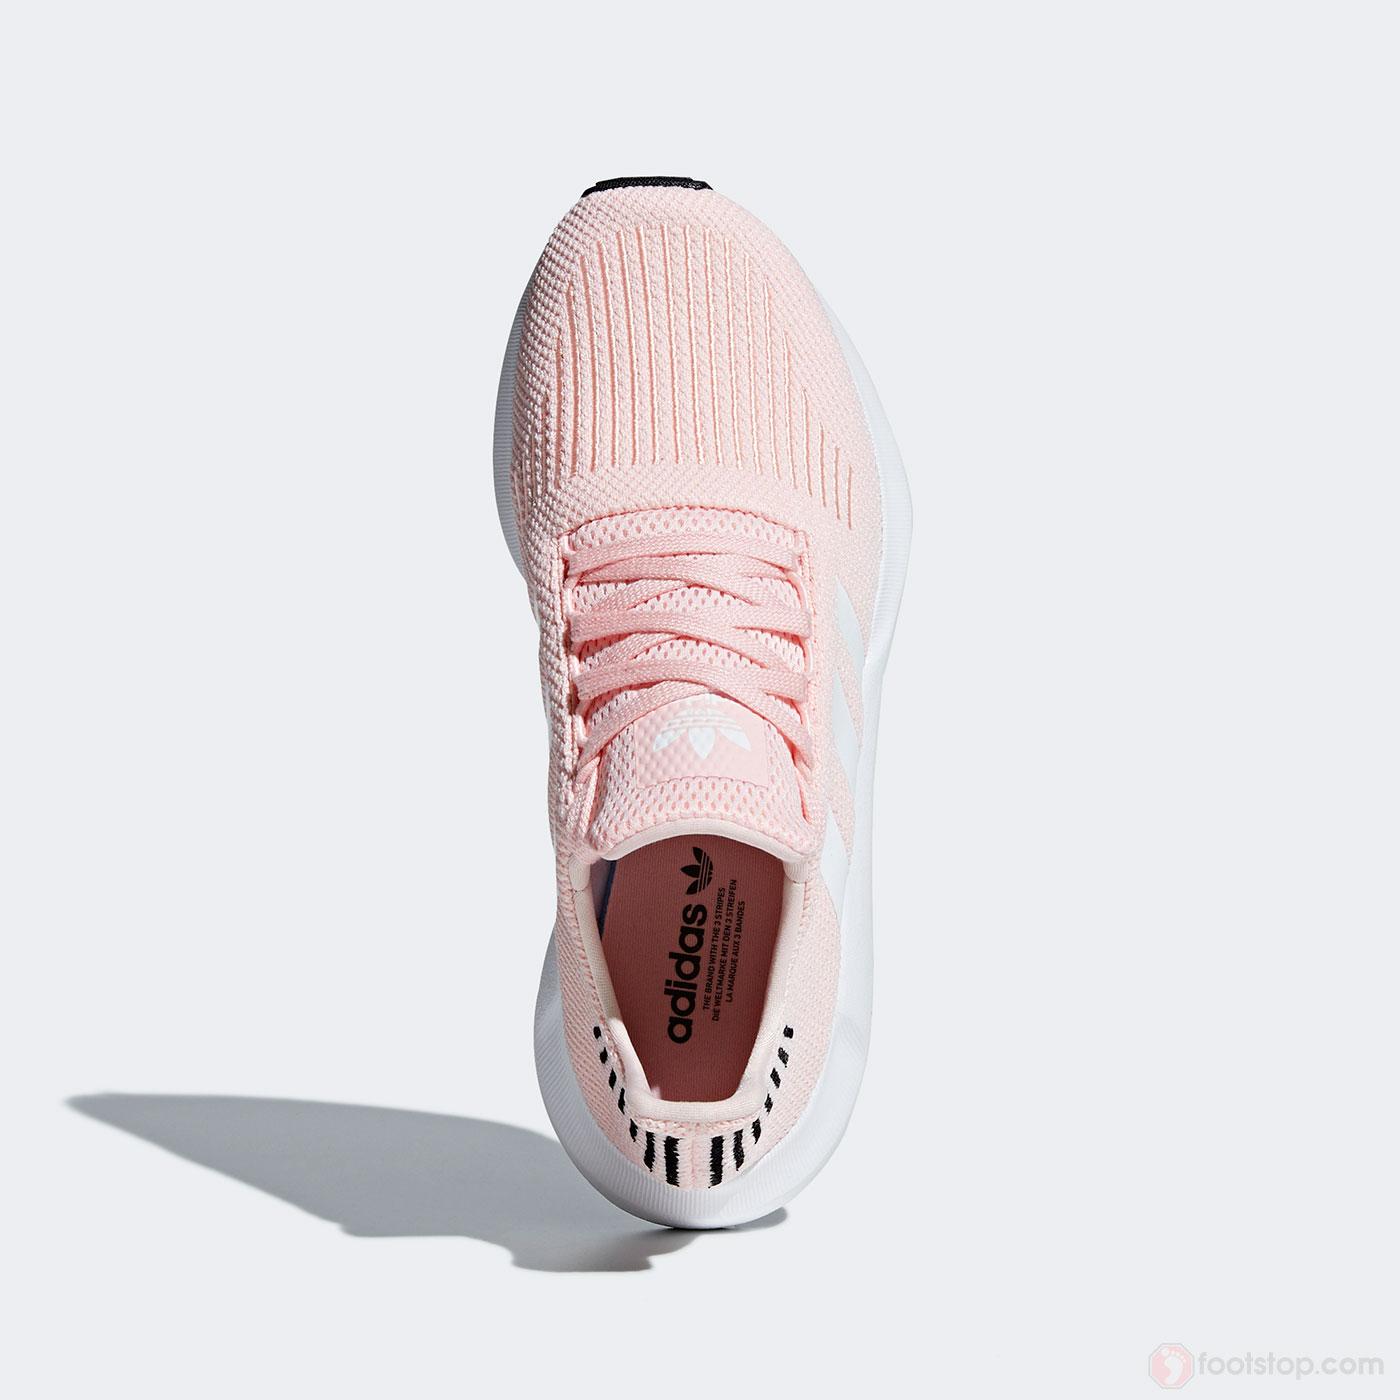 6260b58b8 Home Mujer Zapatillas casual mujer. adidas swift run w ...